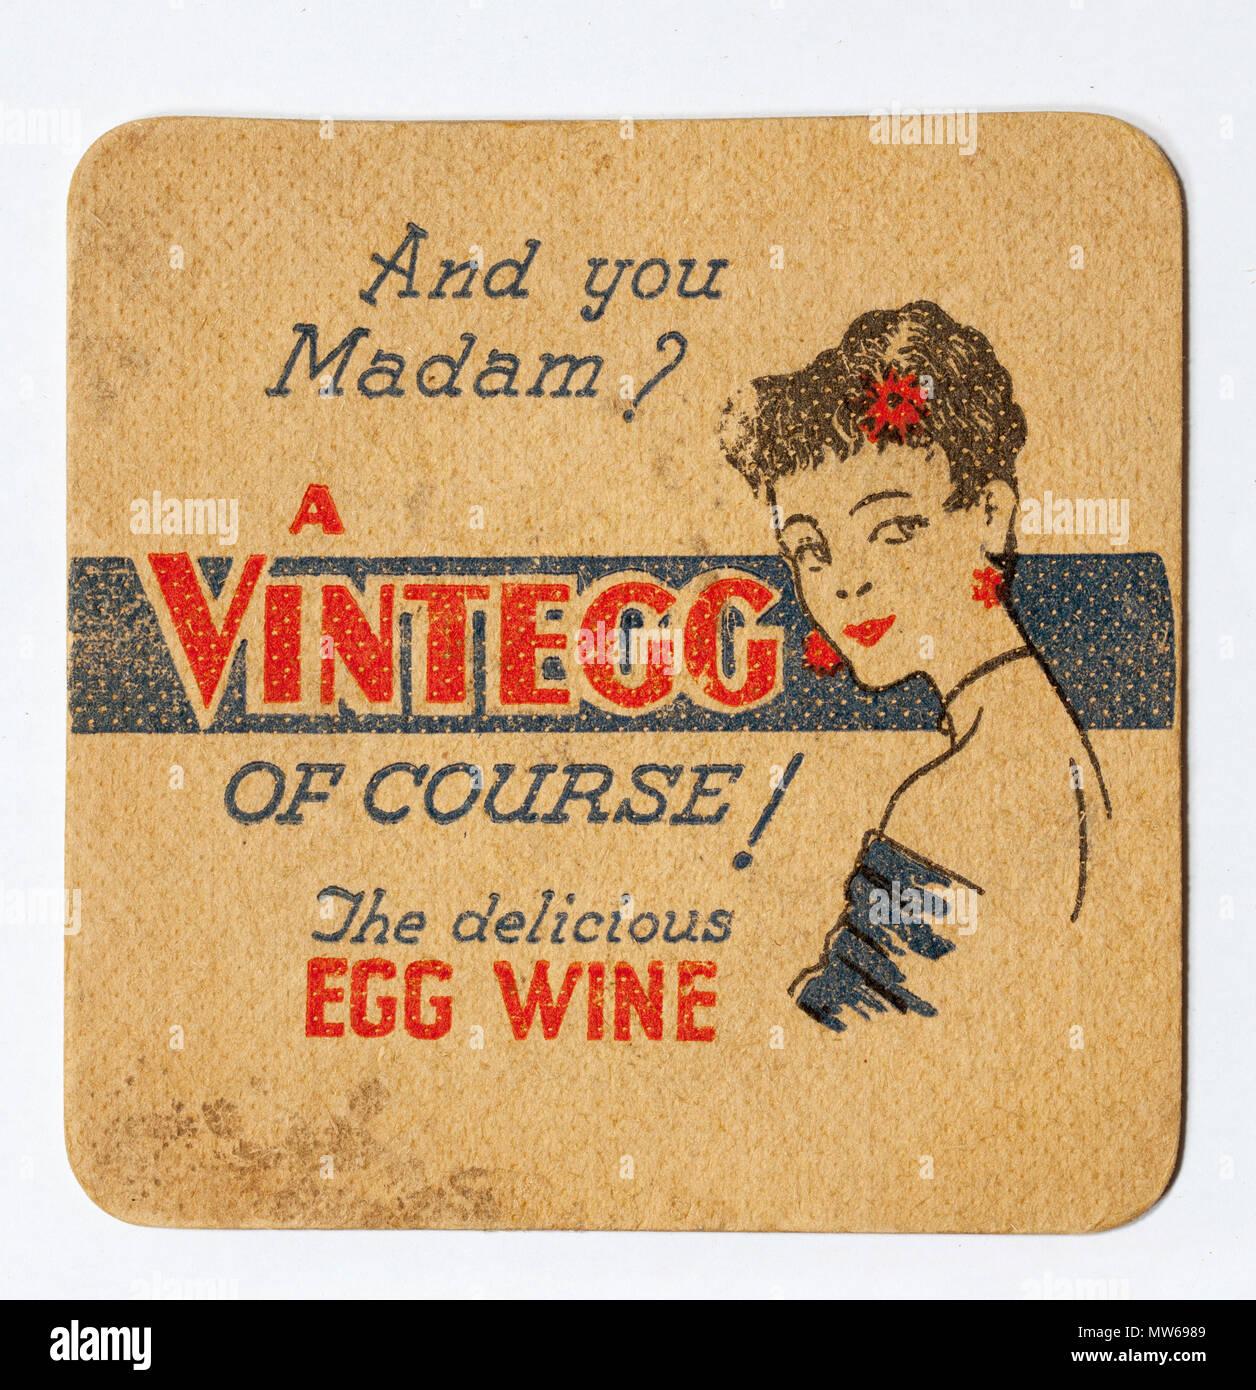 Wine Vintage 1950 s Immagini   Wine Vintage 1950 s Fotos Stock - Alamy 577451e797af